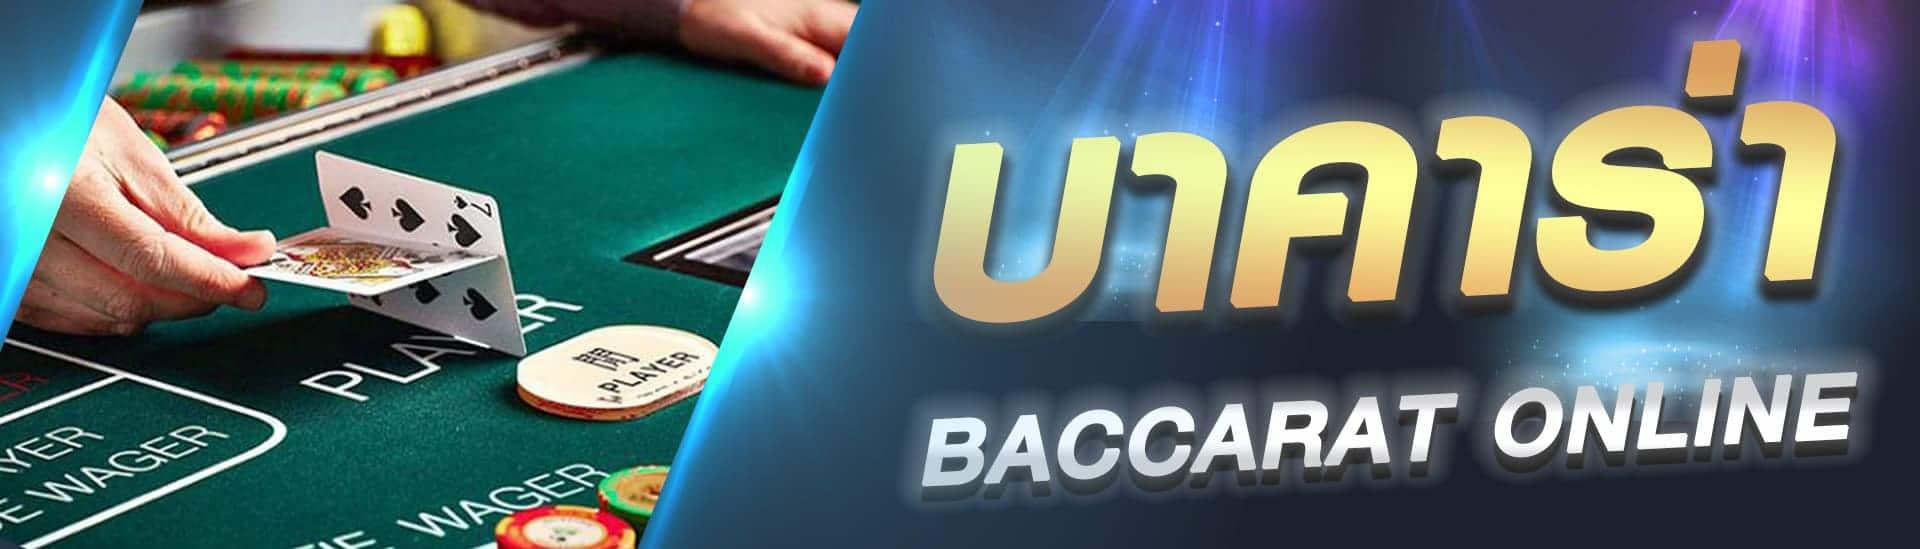 baccart-บาคาร่า-บาคาร่าออนไลน์-bigwin369